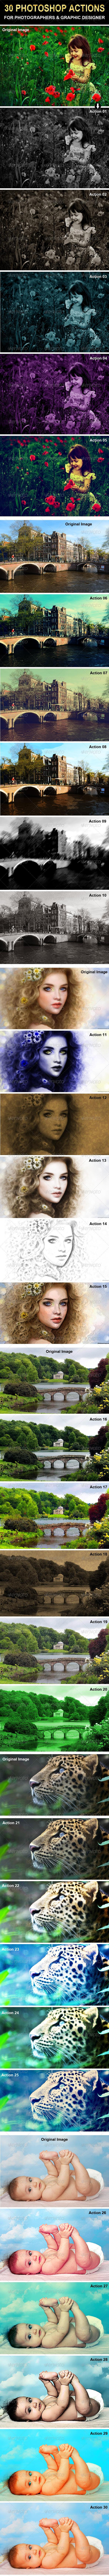 GraphicRiver 30 Photoshop Actions 6566763